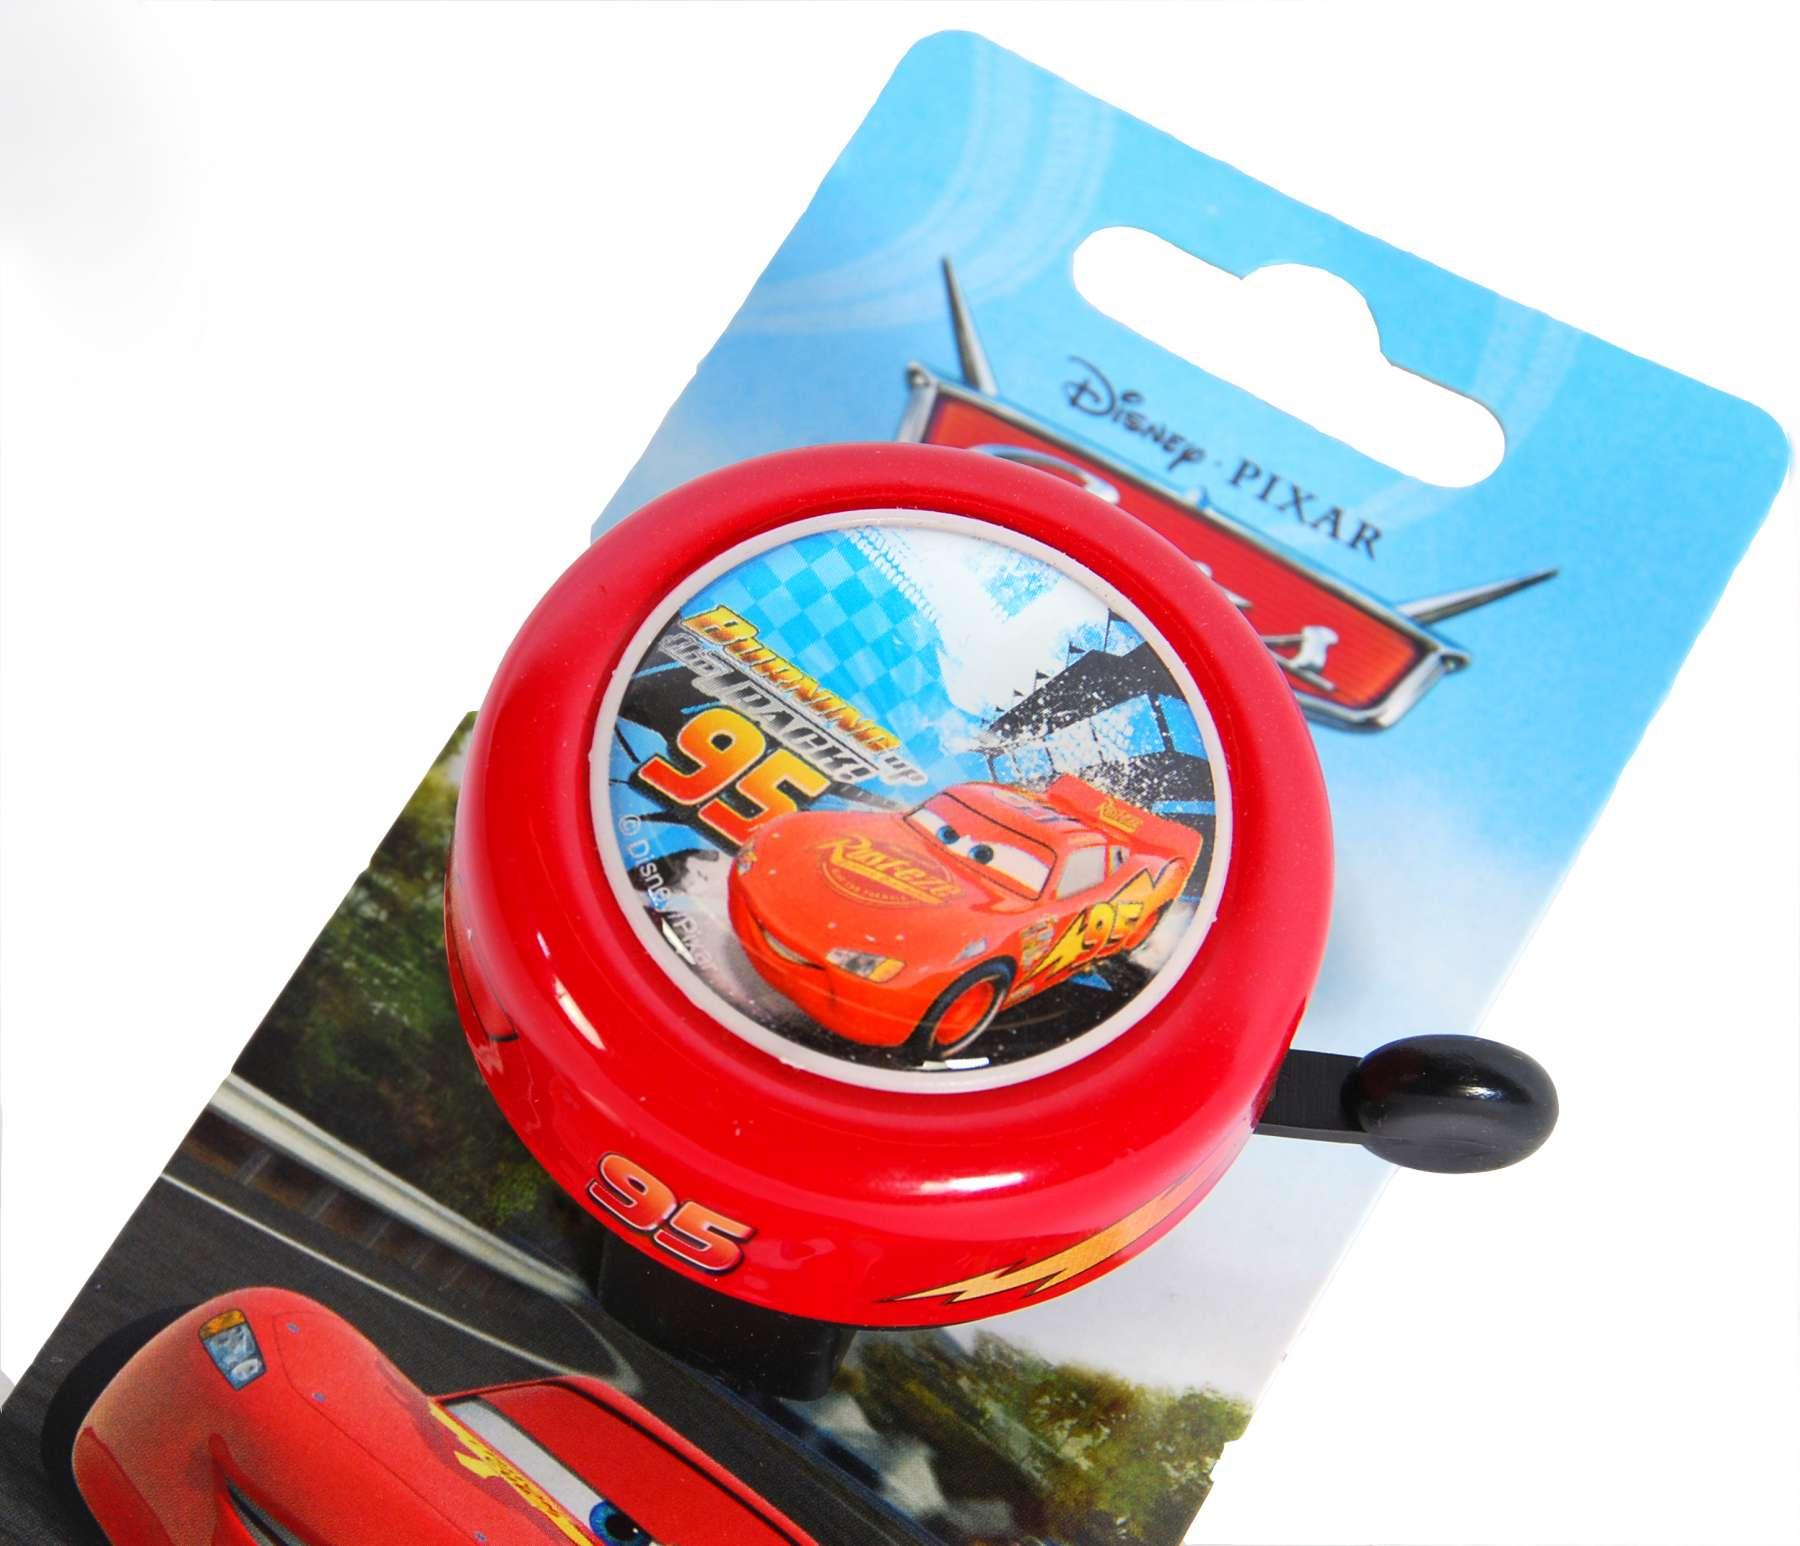 Timbre de bicicleta Disney Cars - vista superior